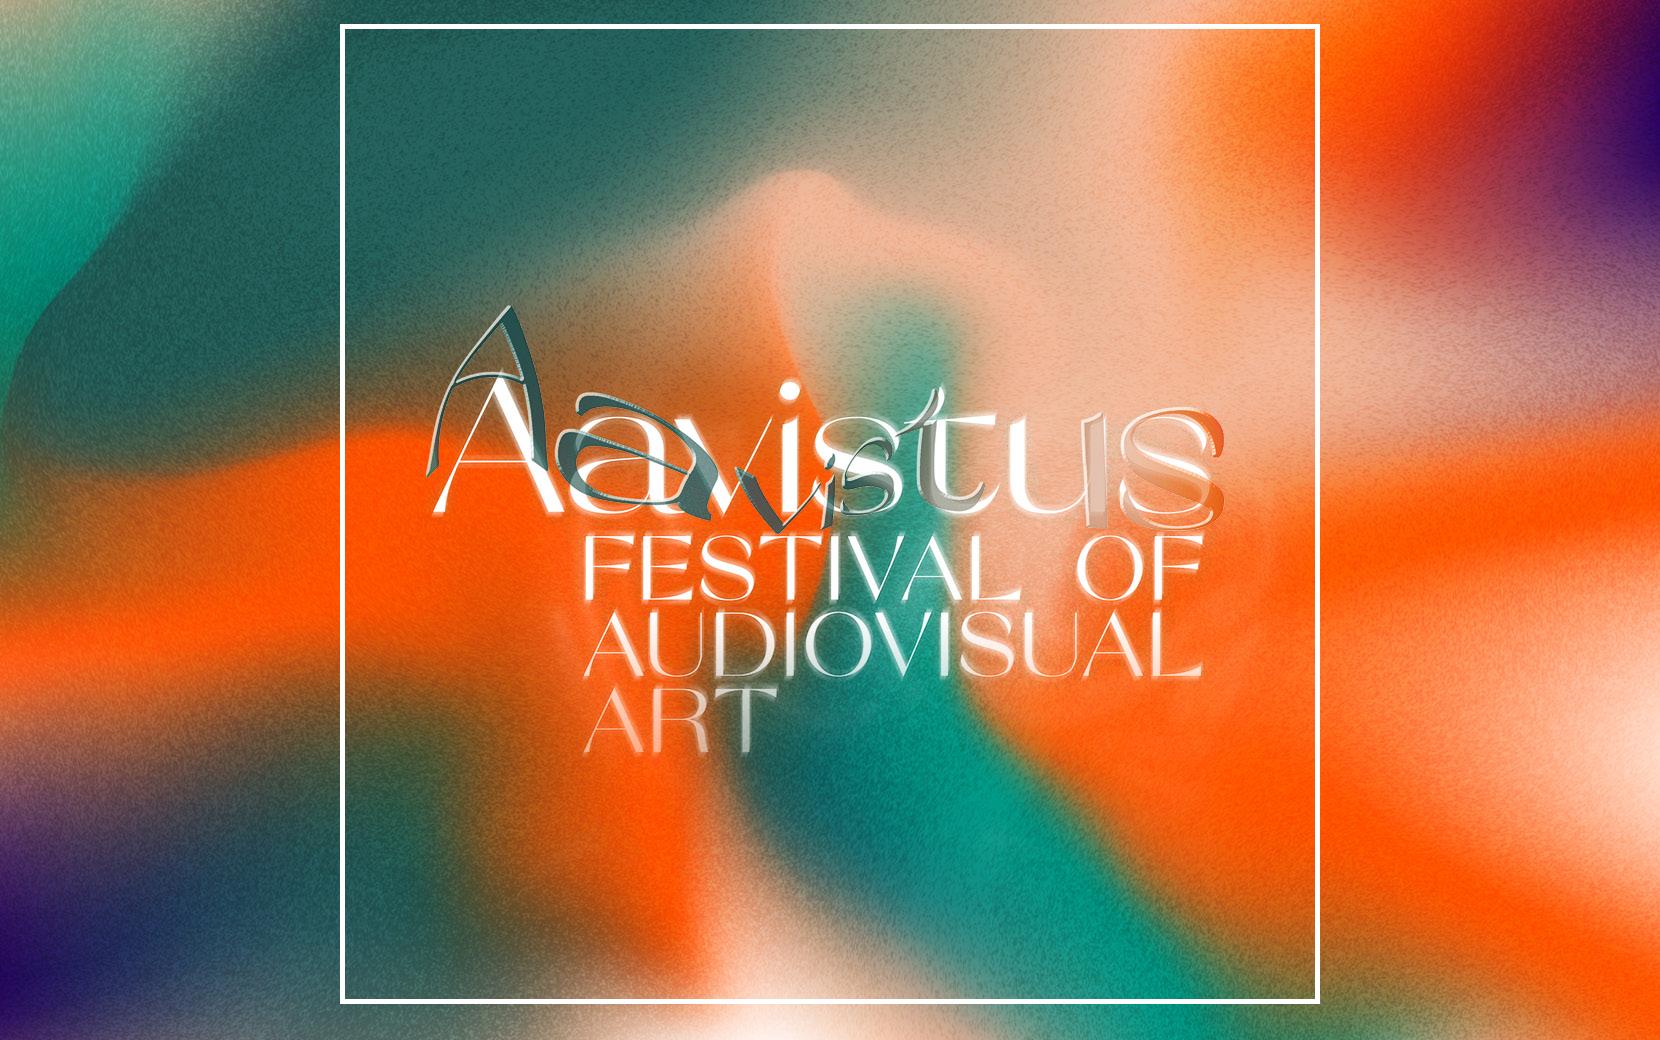 Aavistus Festival